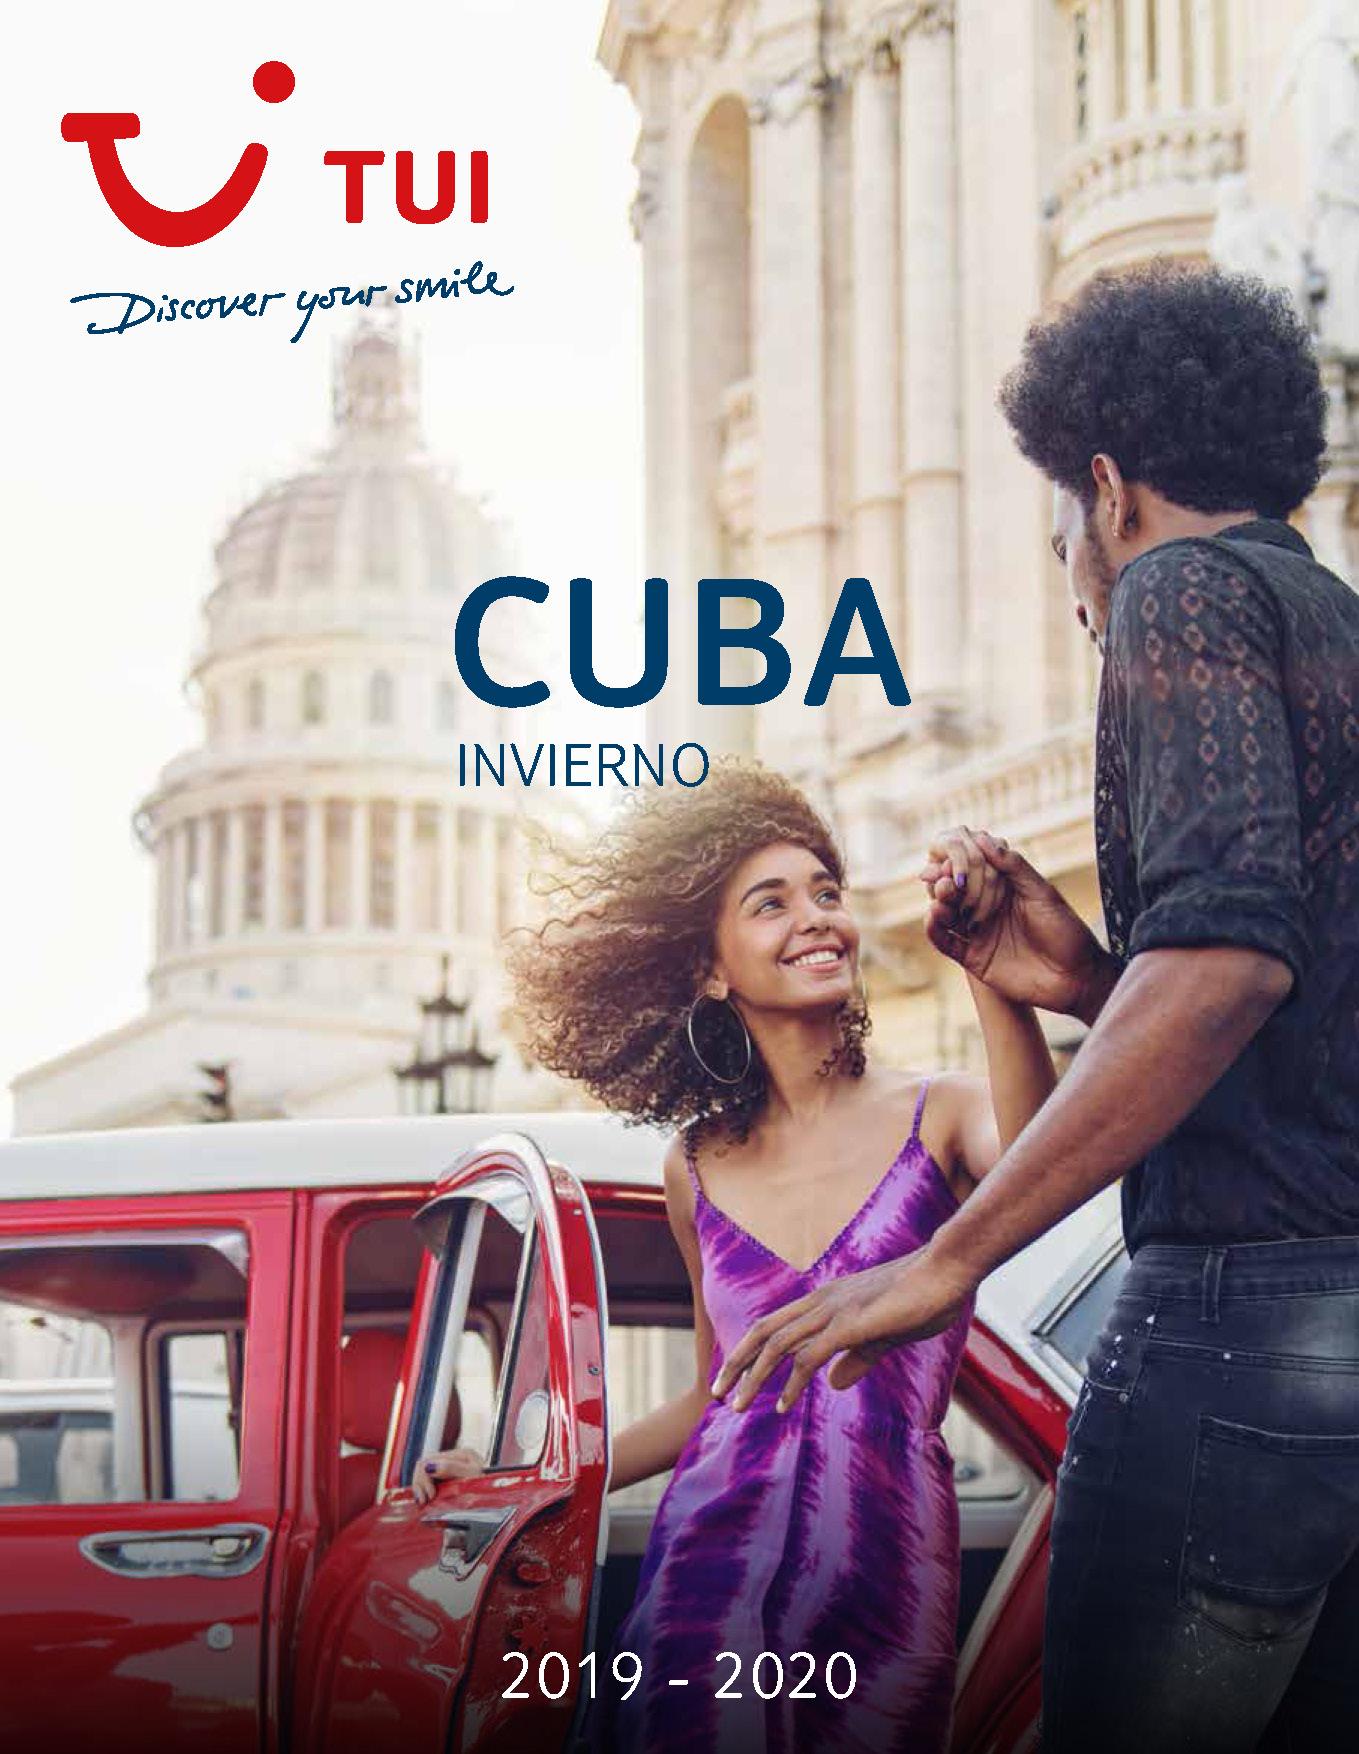 Catalogo TUI Ambassador Tours Cuba Invierno 2019-2020